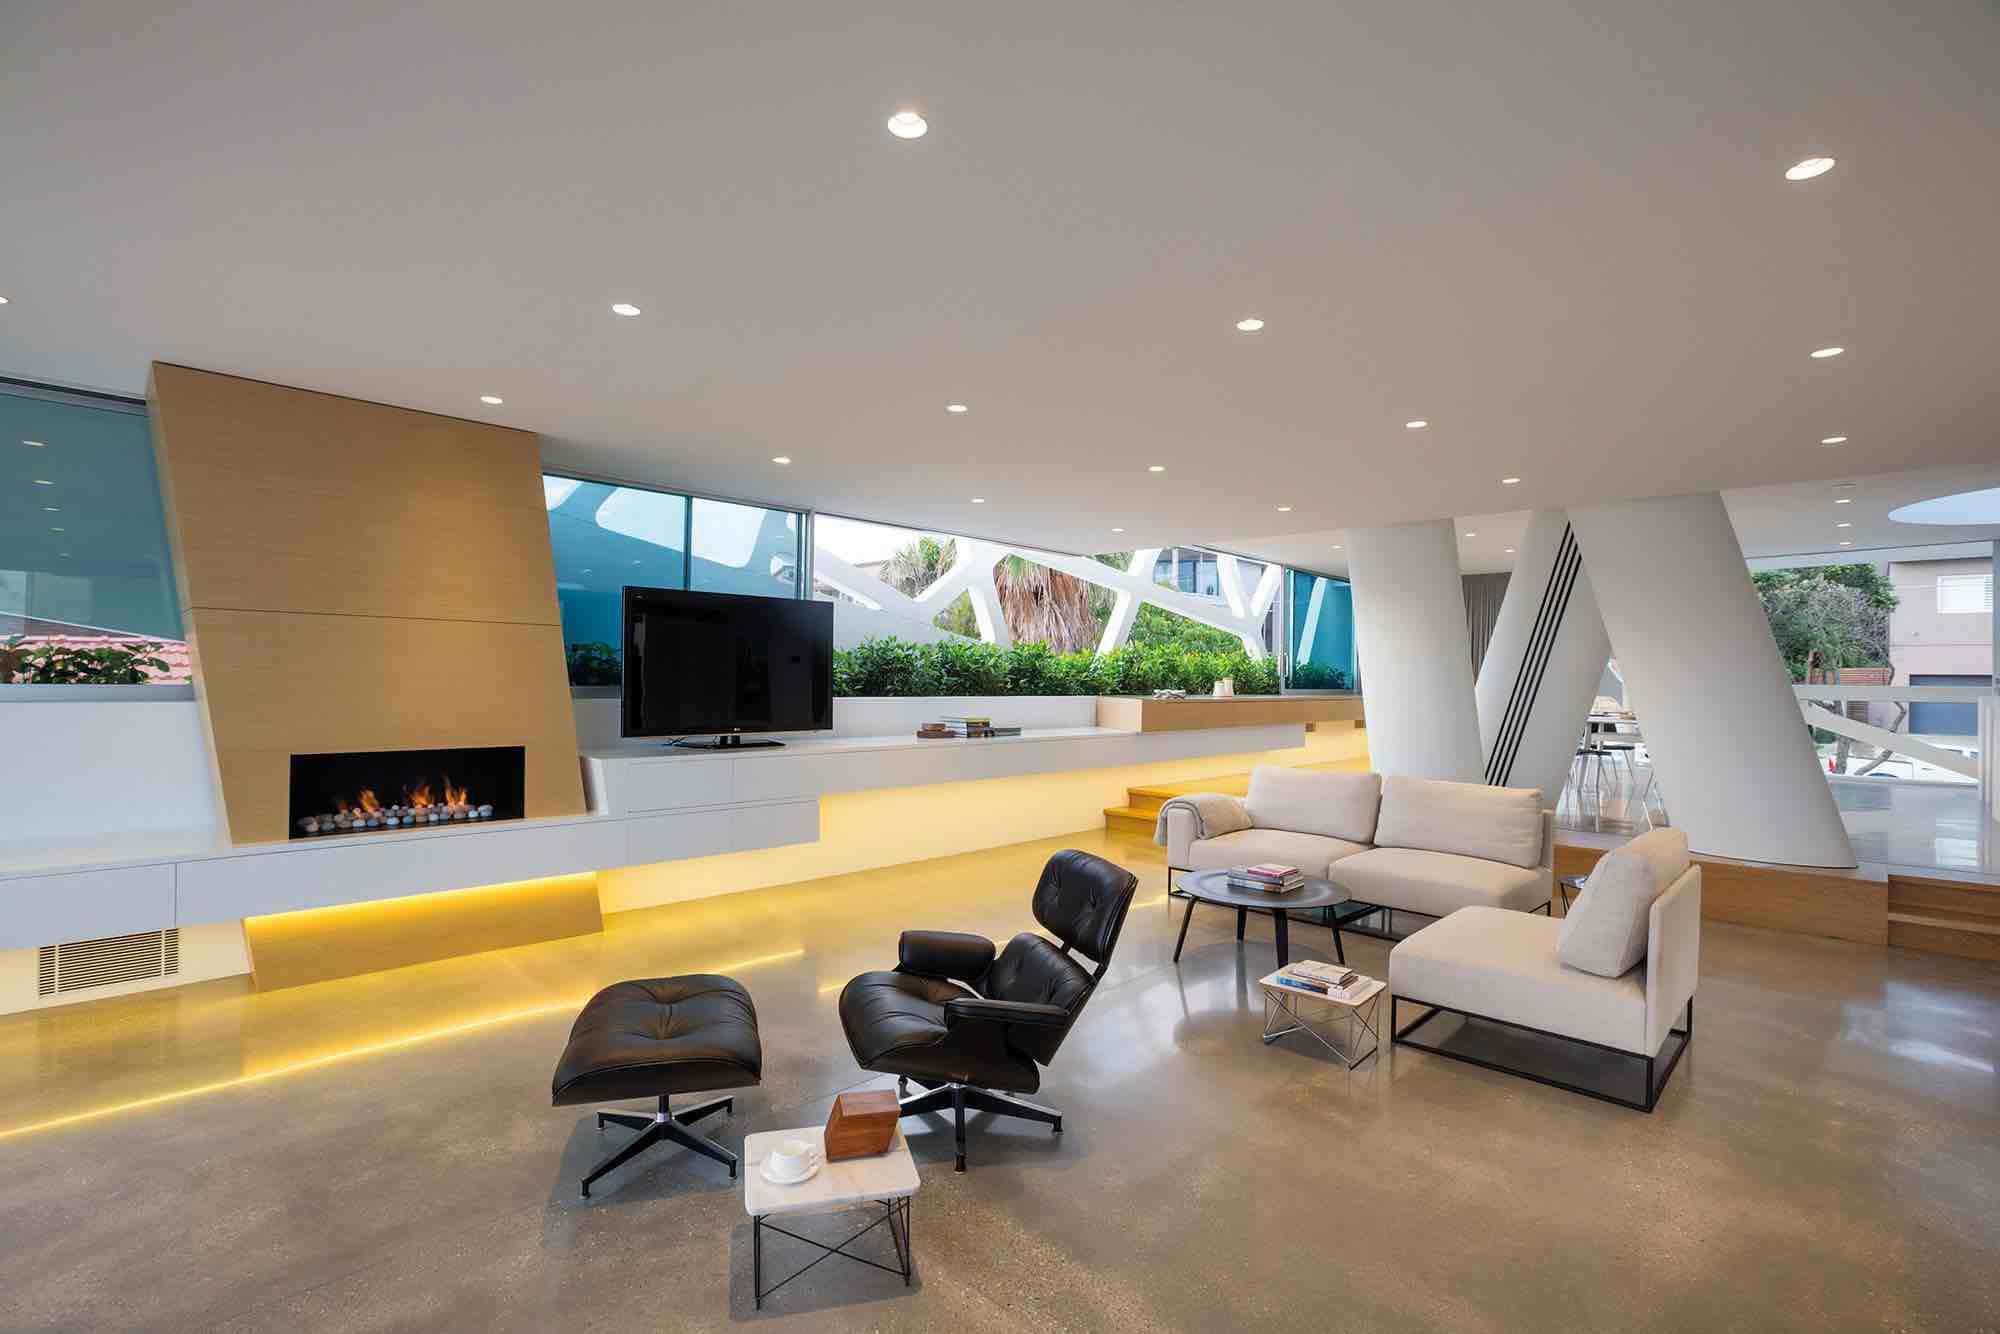 hewlett-street-house-mpr-design-group_hewlett_house16